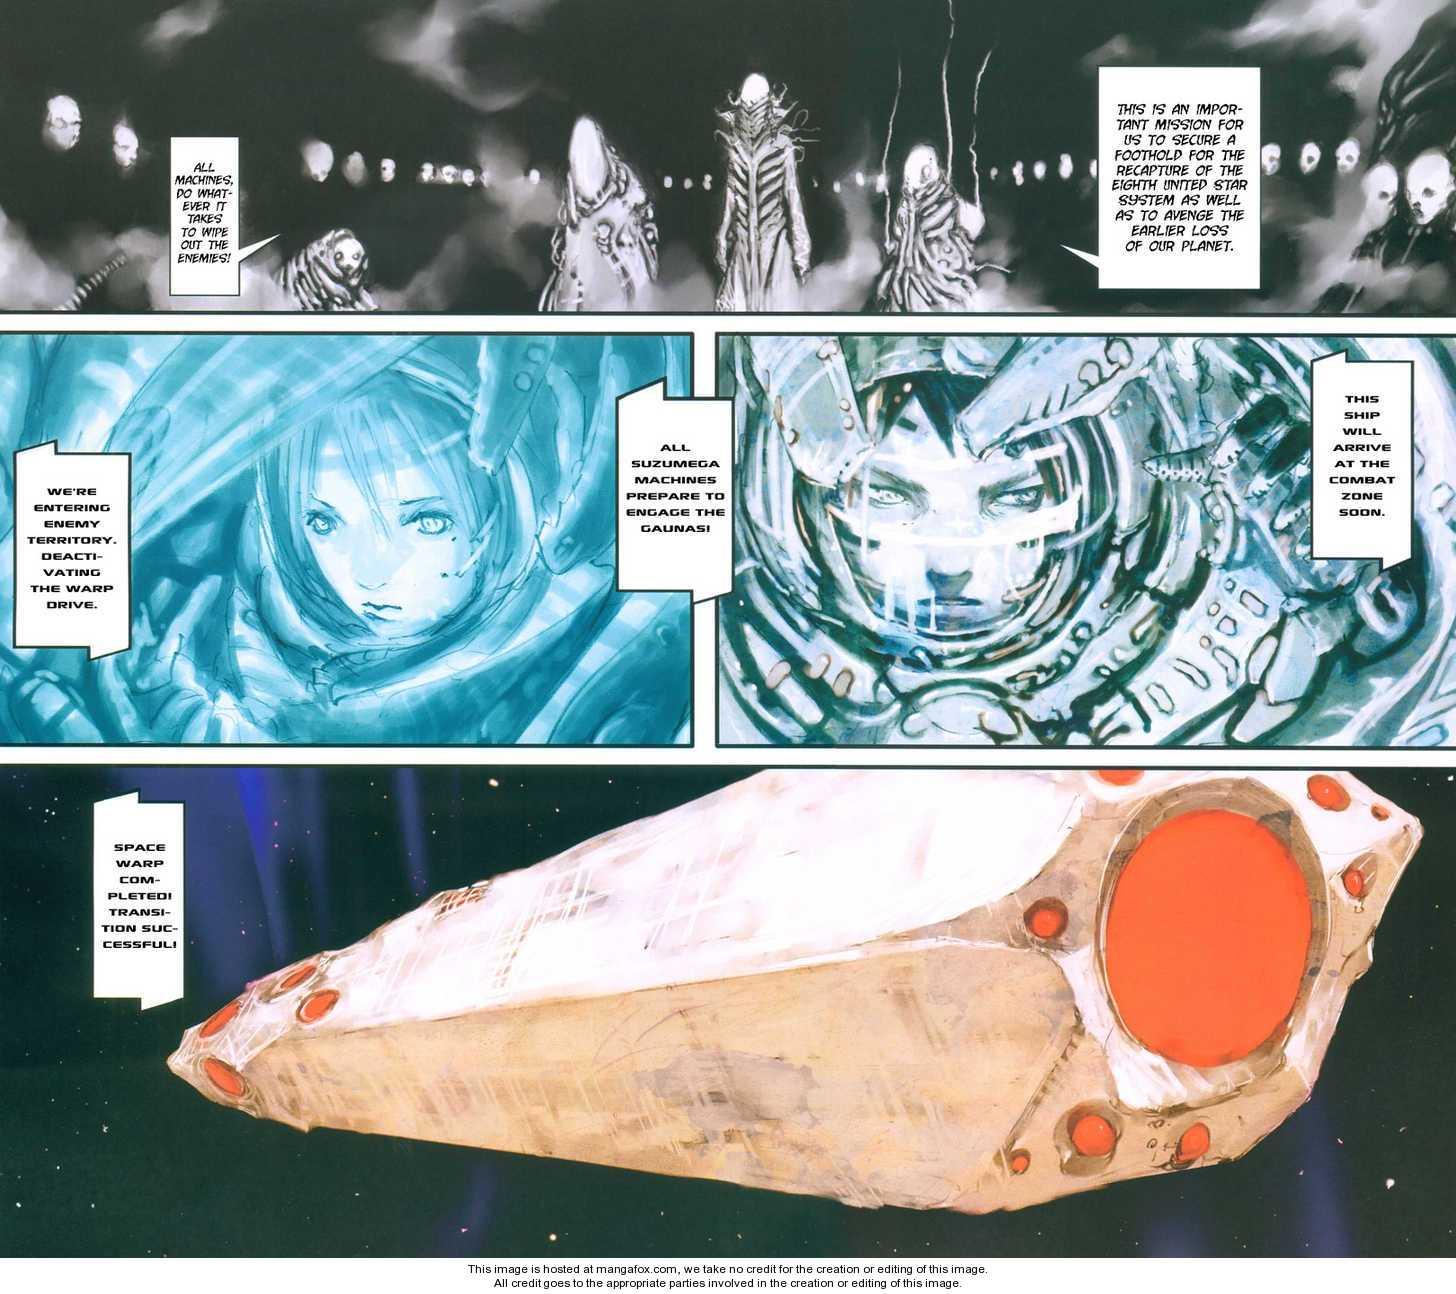 Winged Armor Suzumega 0 Page 2